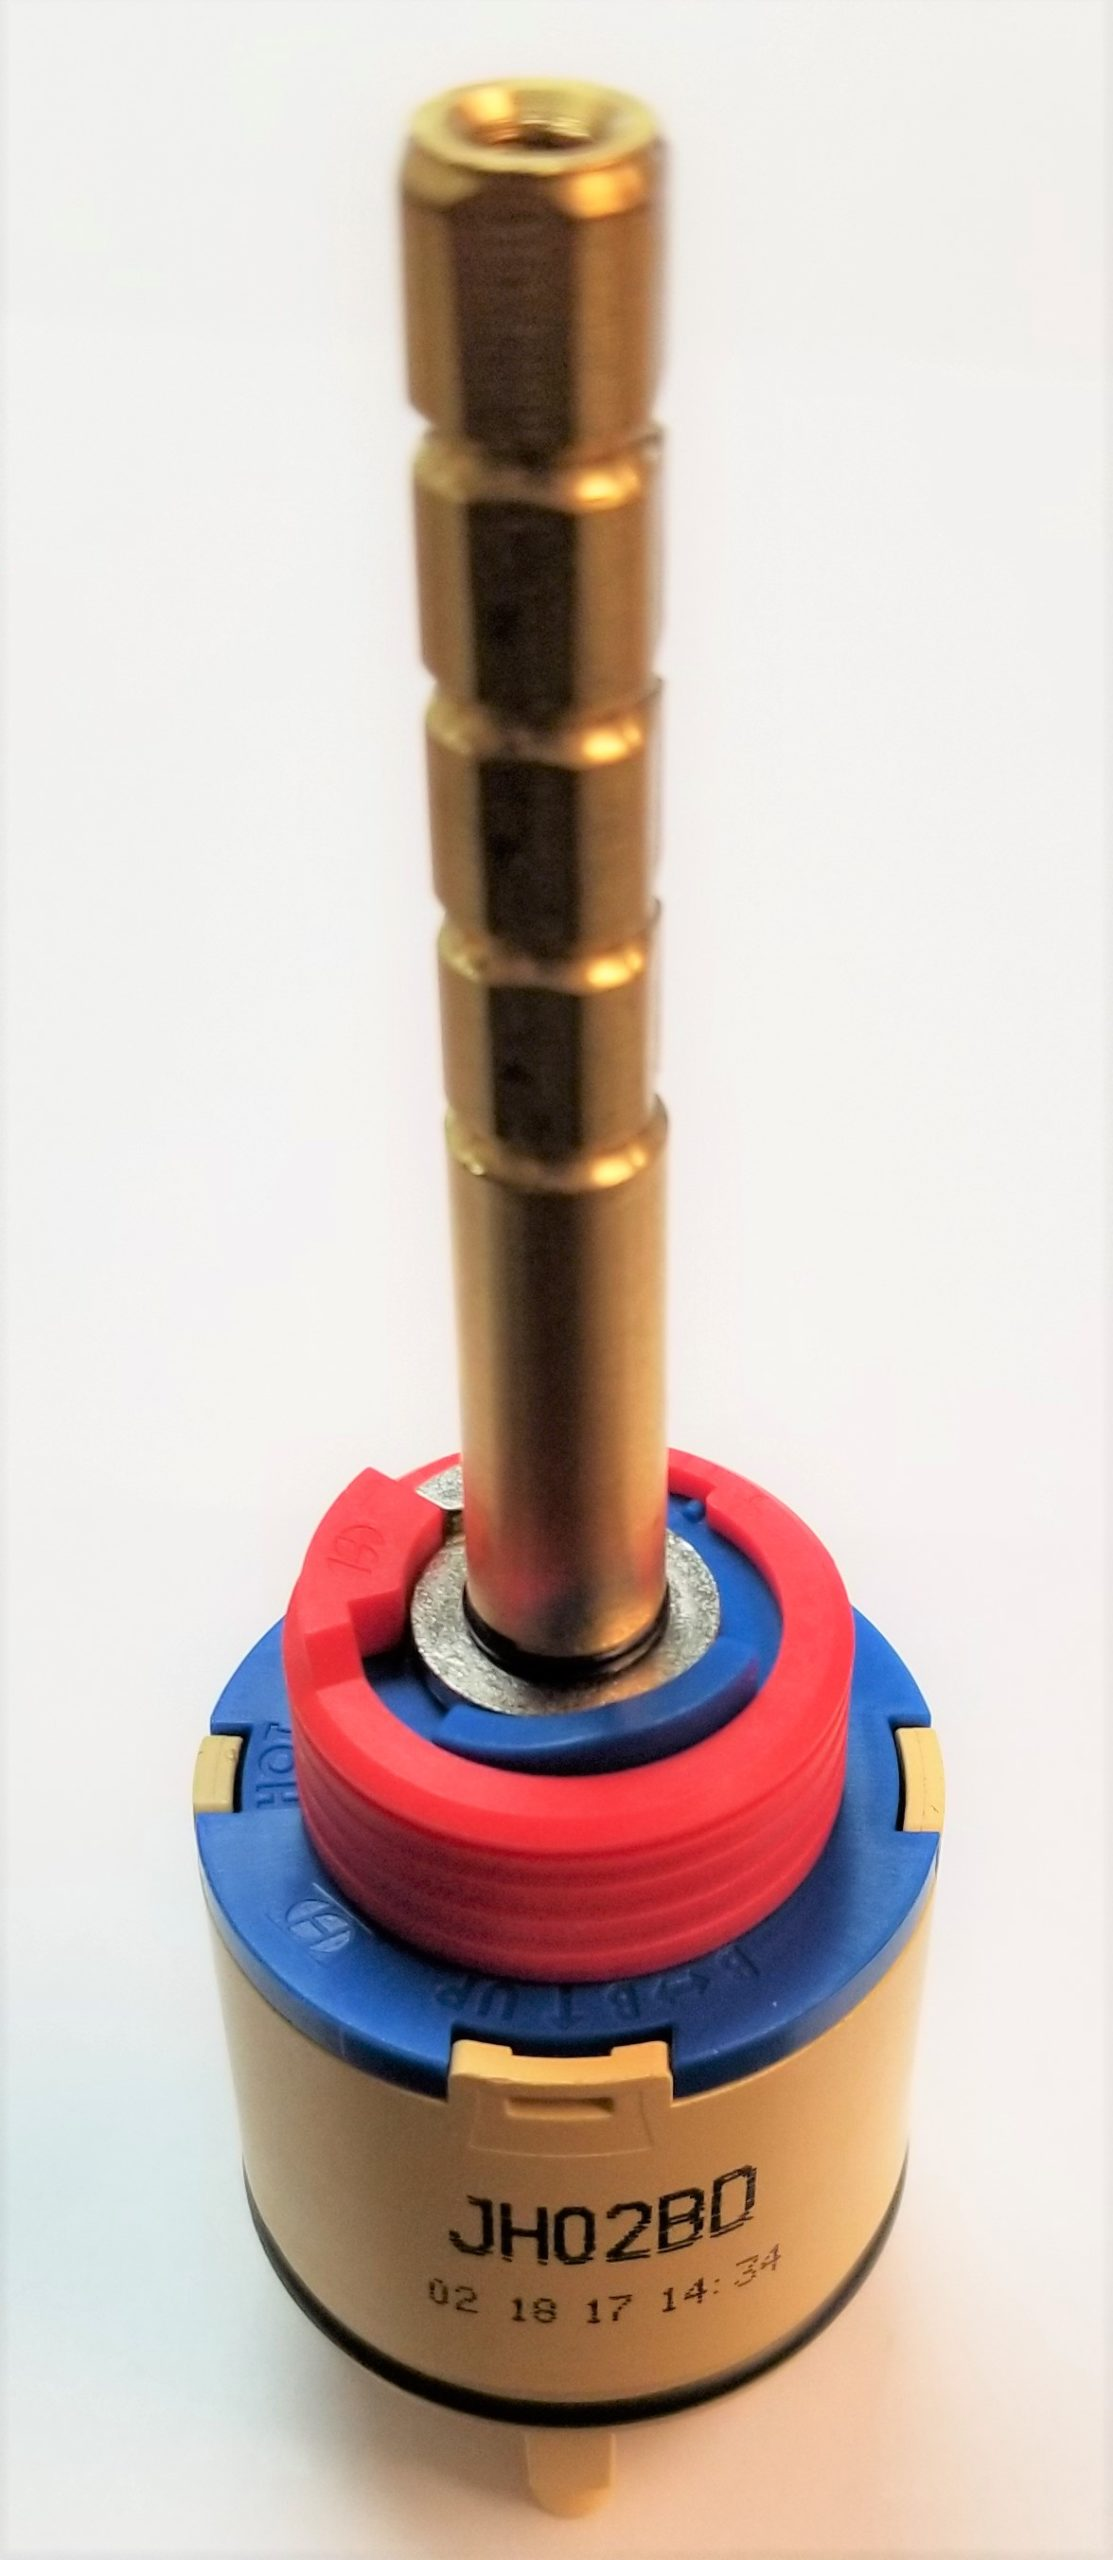 40mm single lever pressure balance